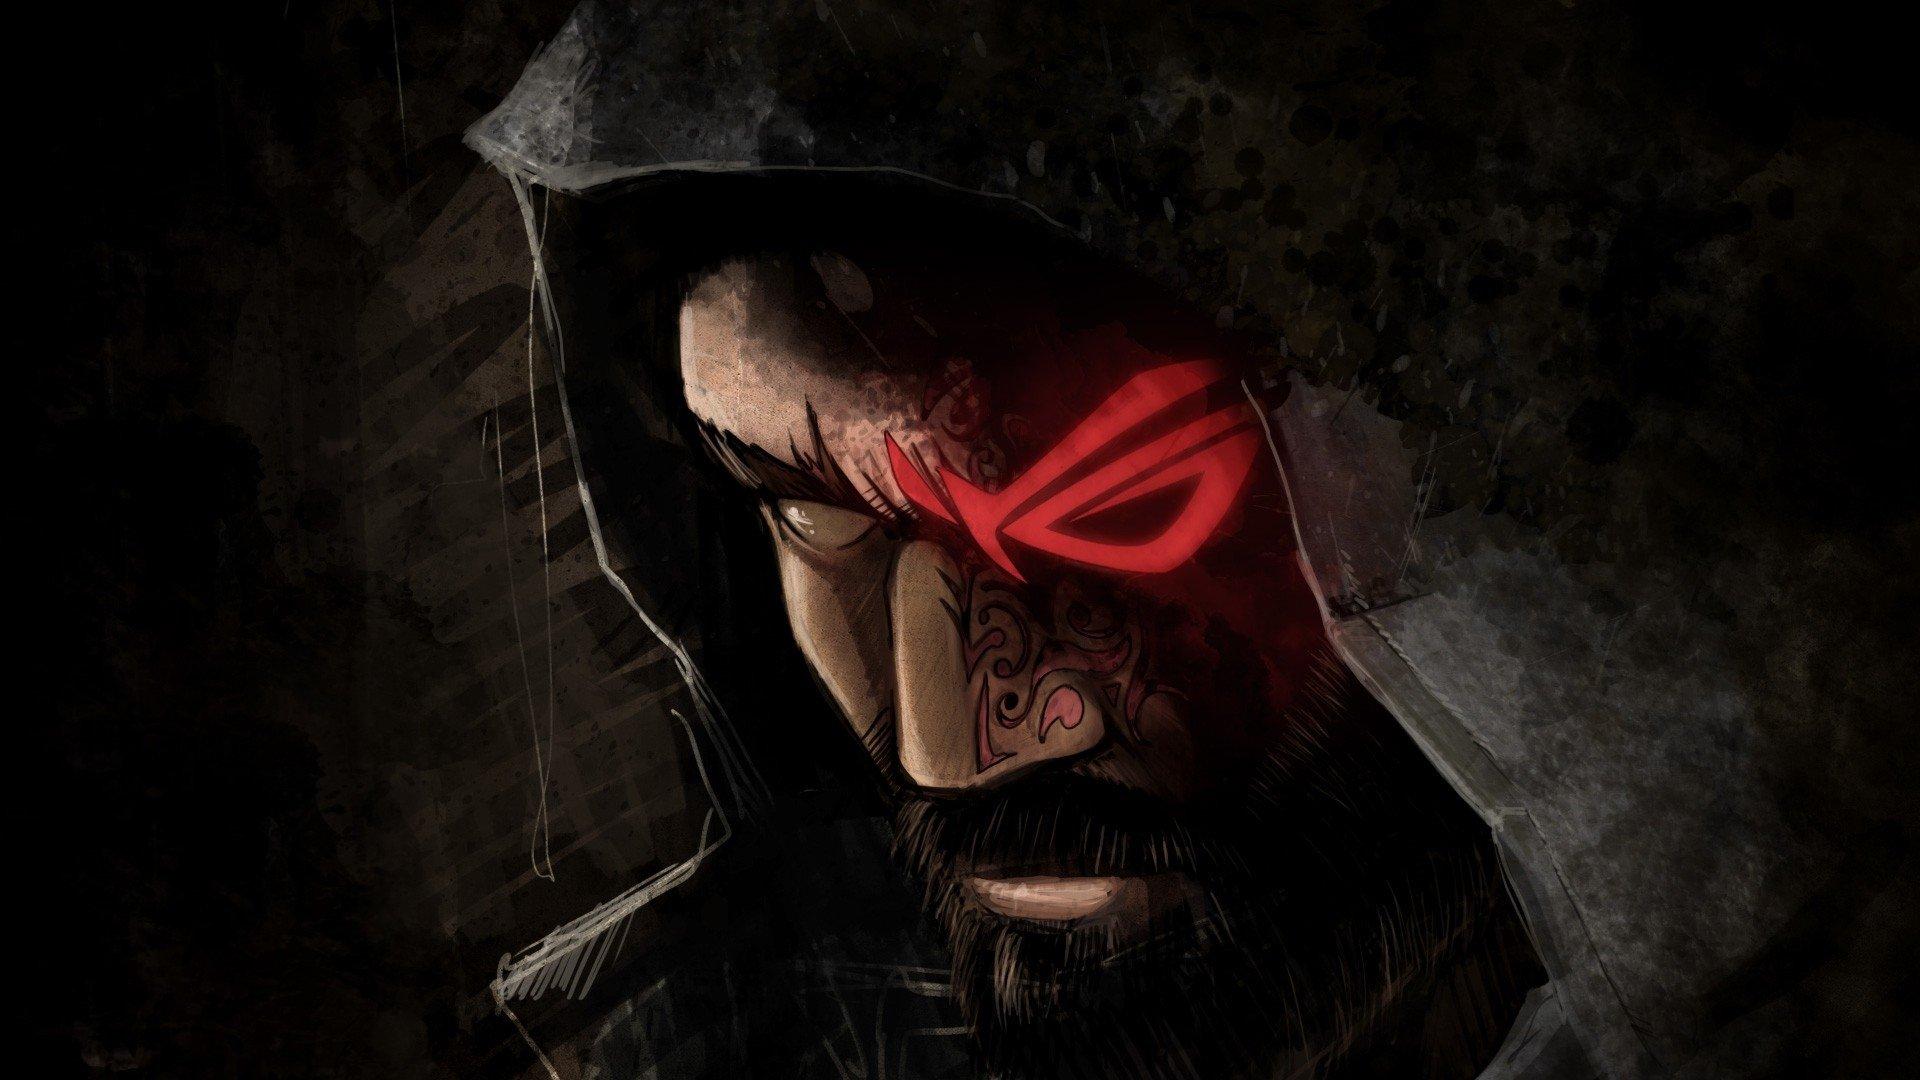 Red Riding Hood Wallpaper Desktop K HQ Definition Pics NM.CP